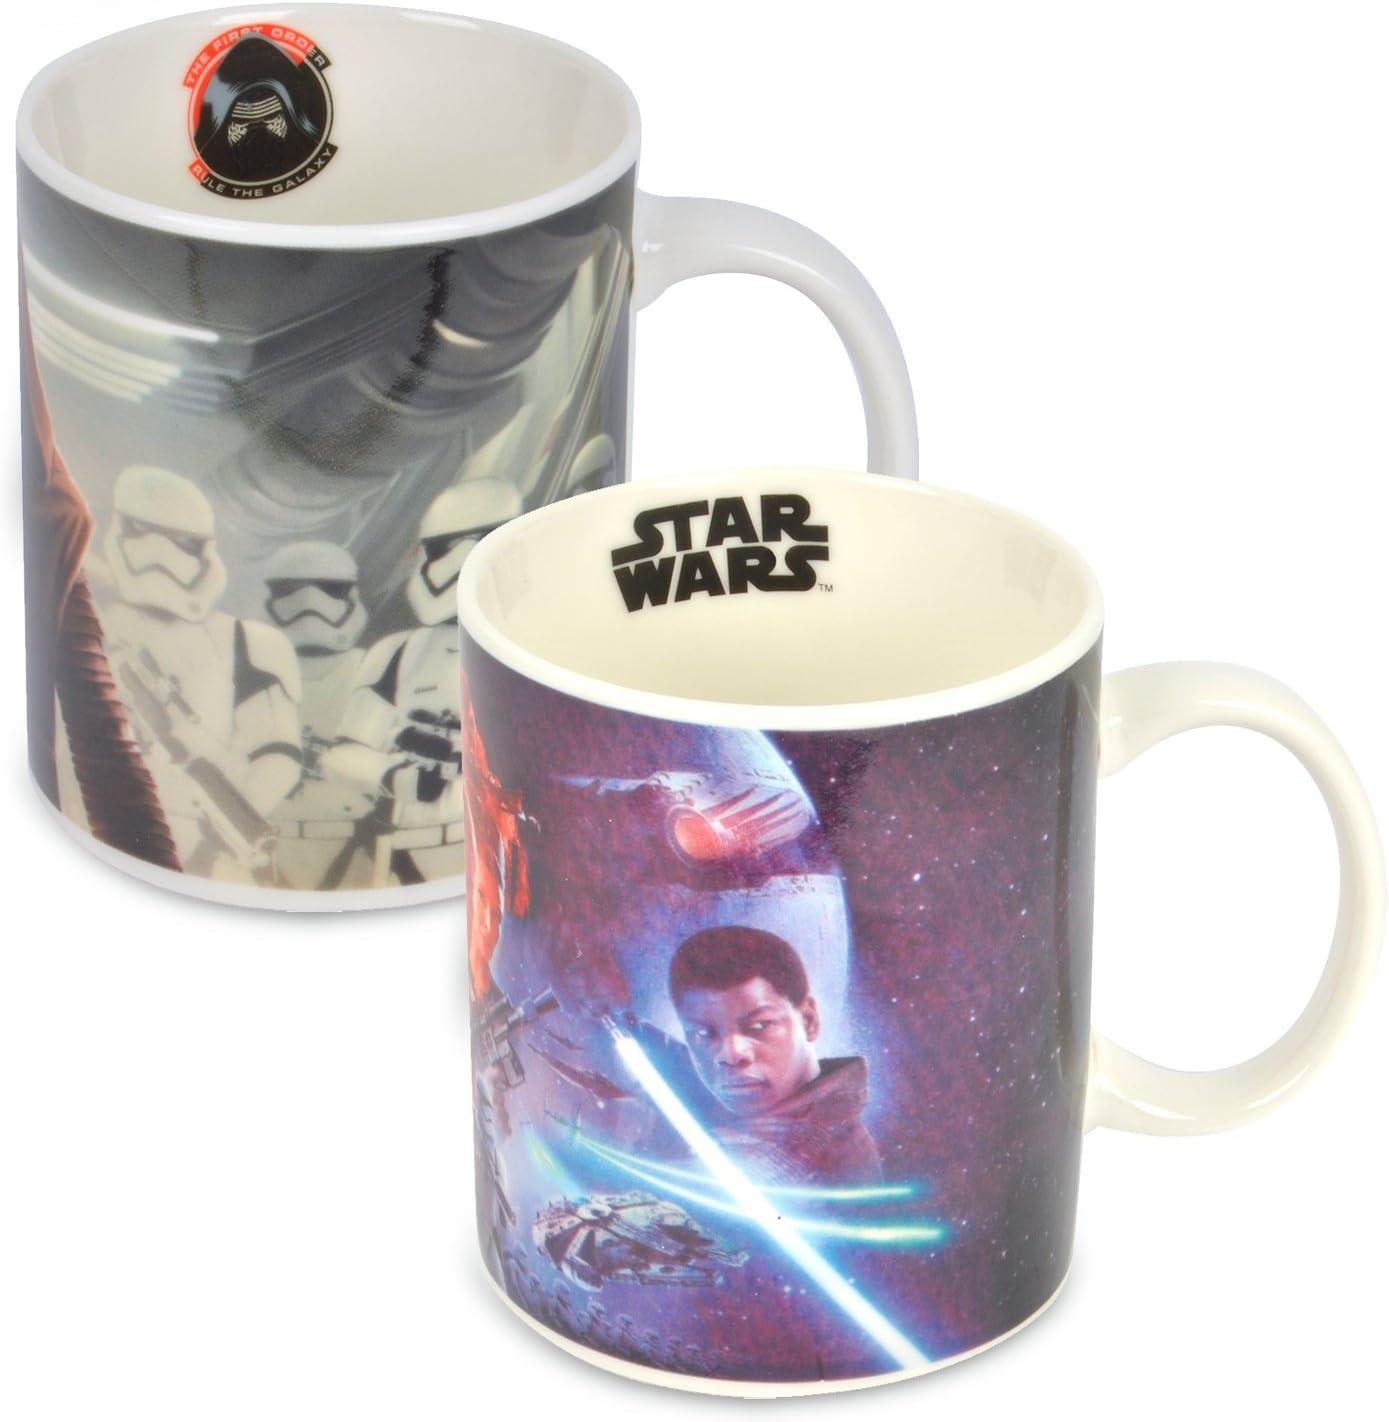 Ideal casa Pack de 2 Tazas. Mugs de Star Wars 325ml Porcelana New ...